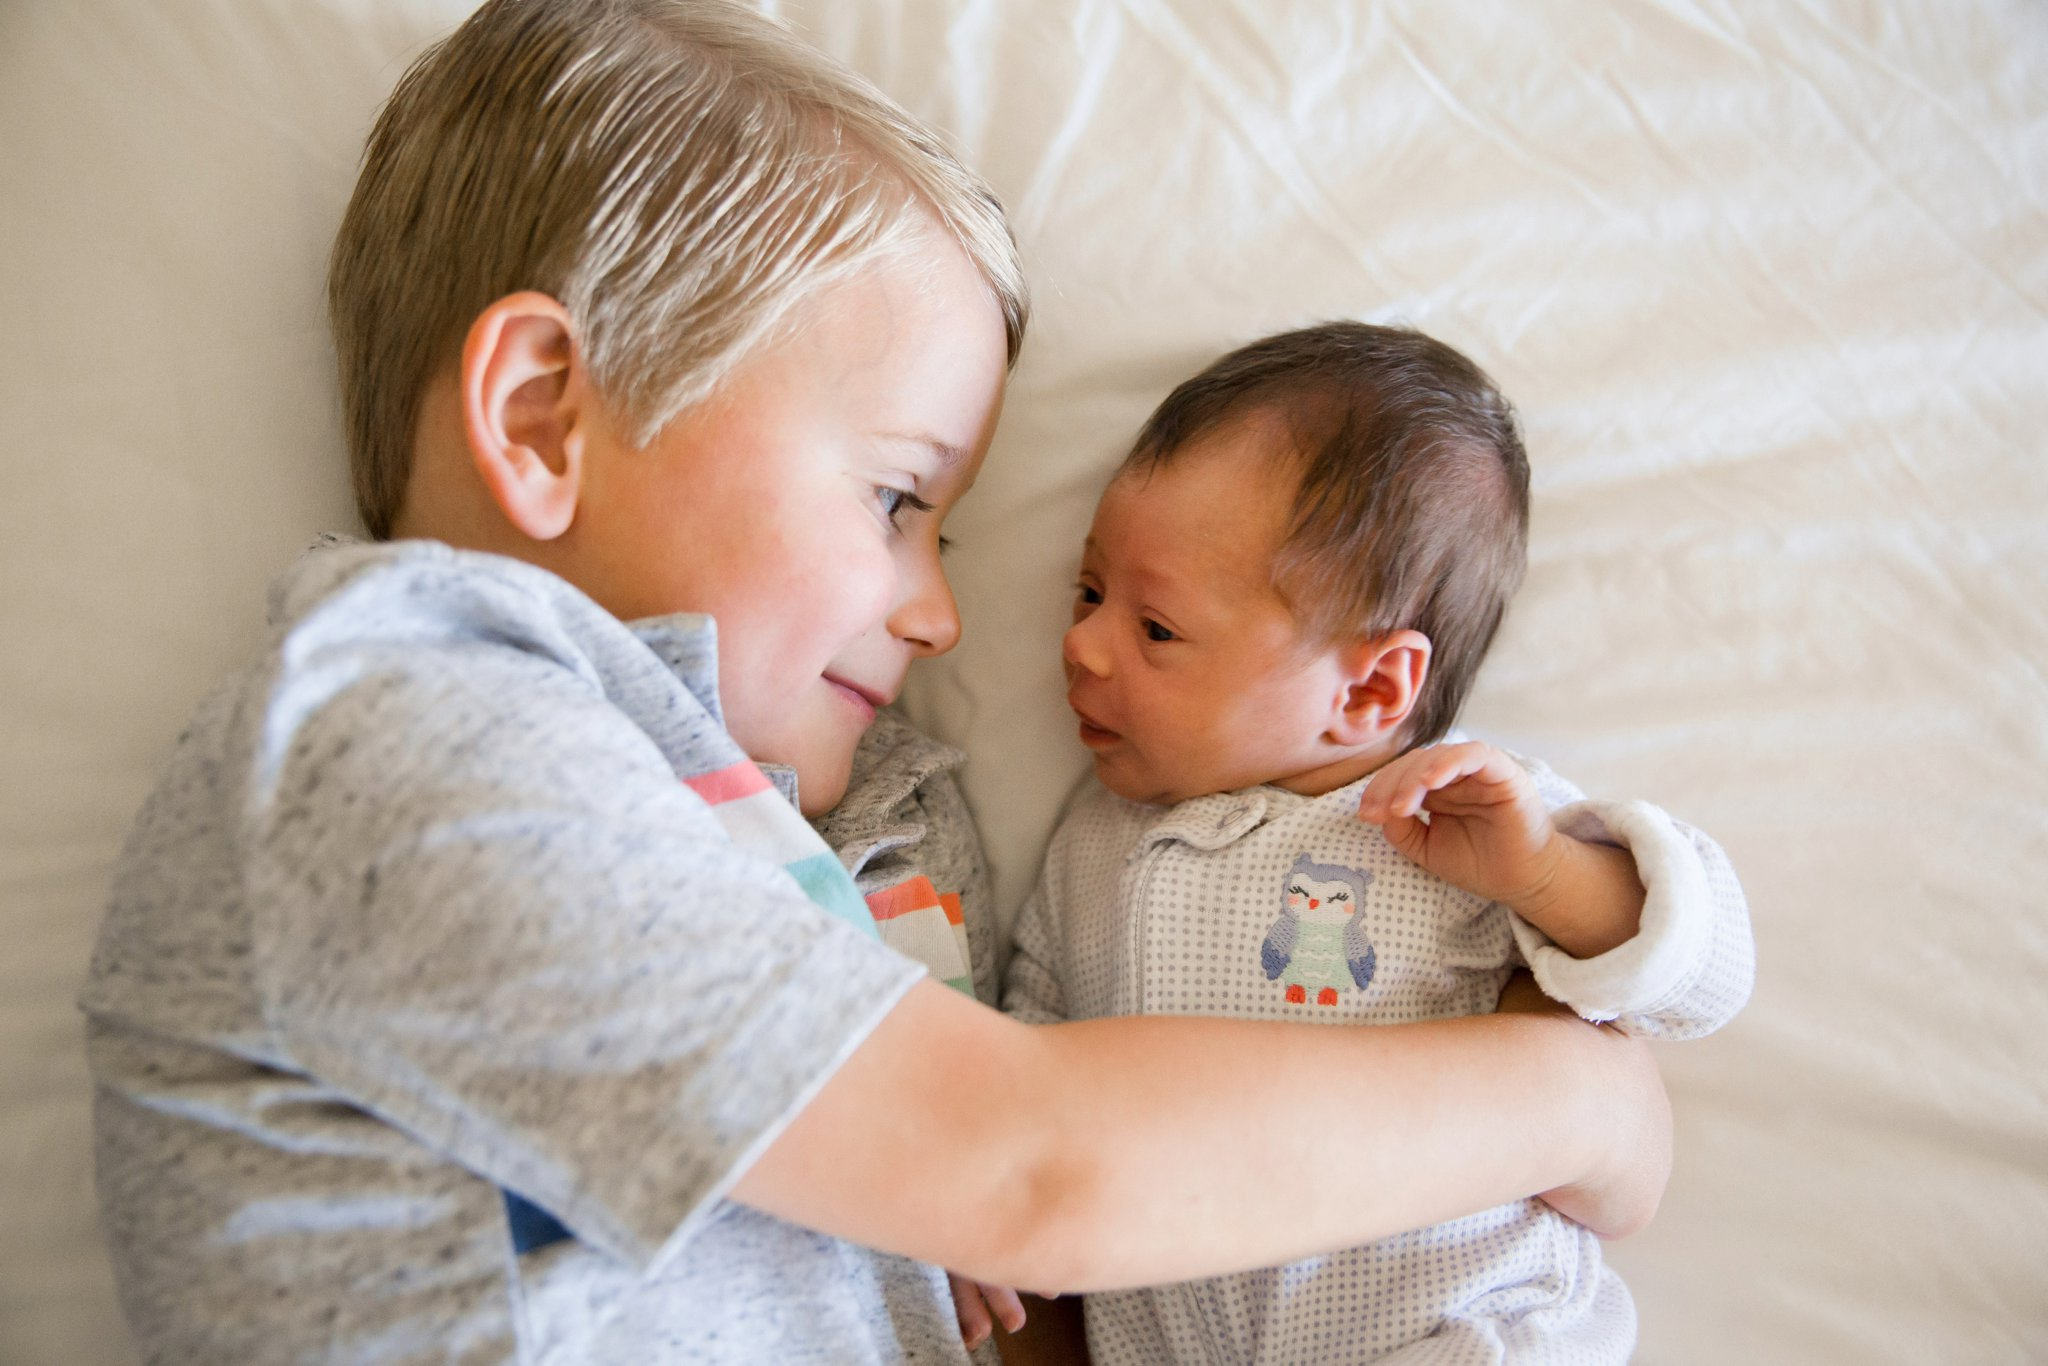 lubbock-lifestyle-newborn-photographer02.jpg